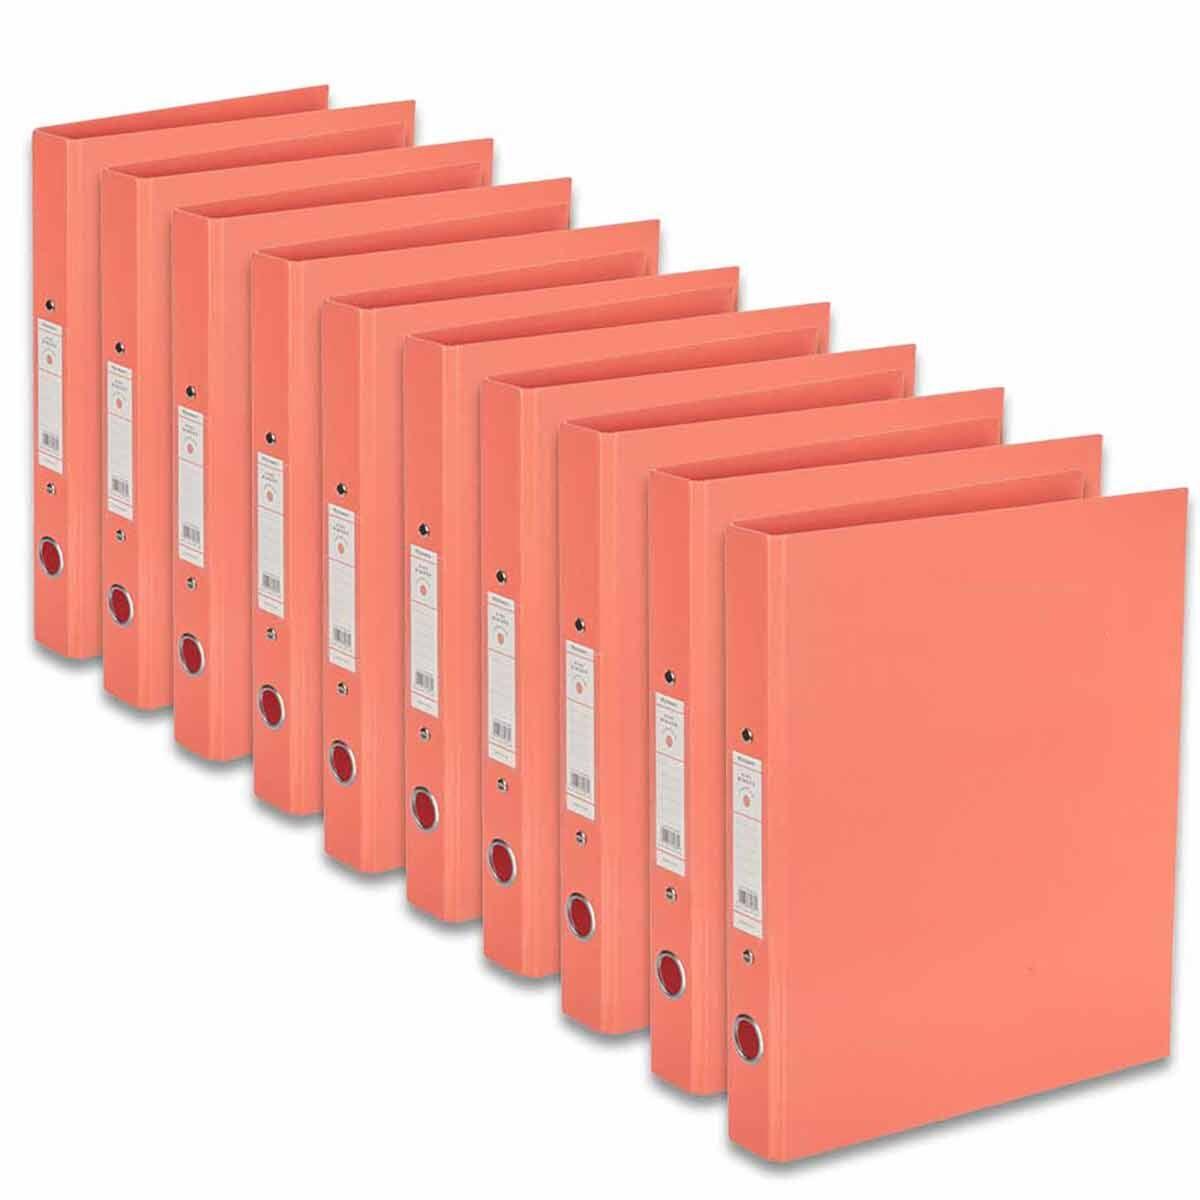 Ryman Premium Ring Binder A4 Pack of 10 Coral